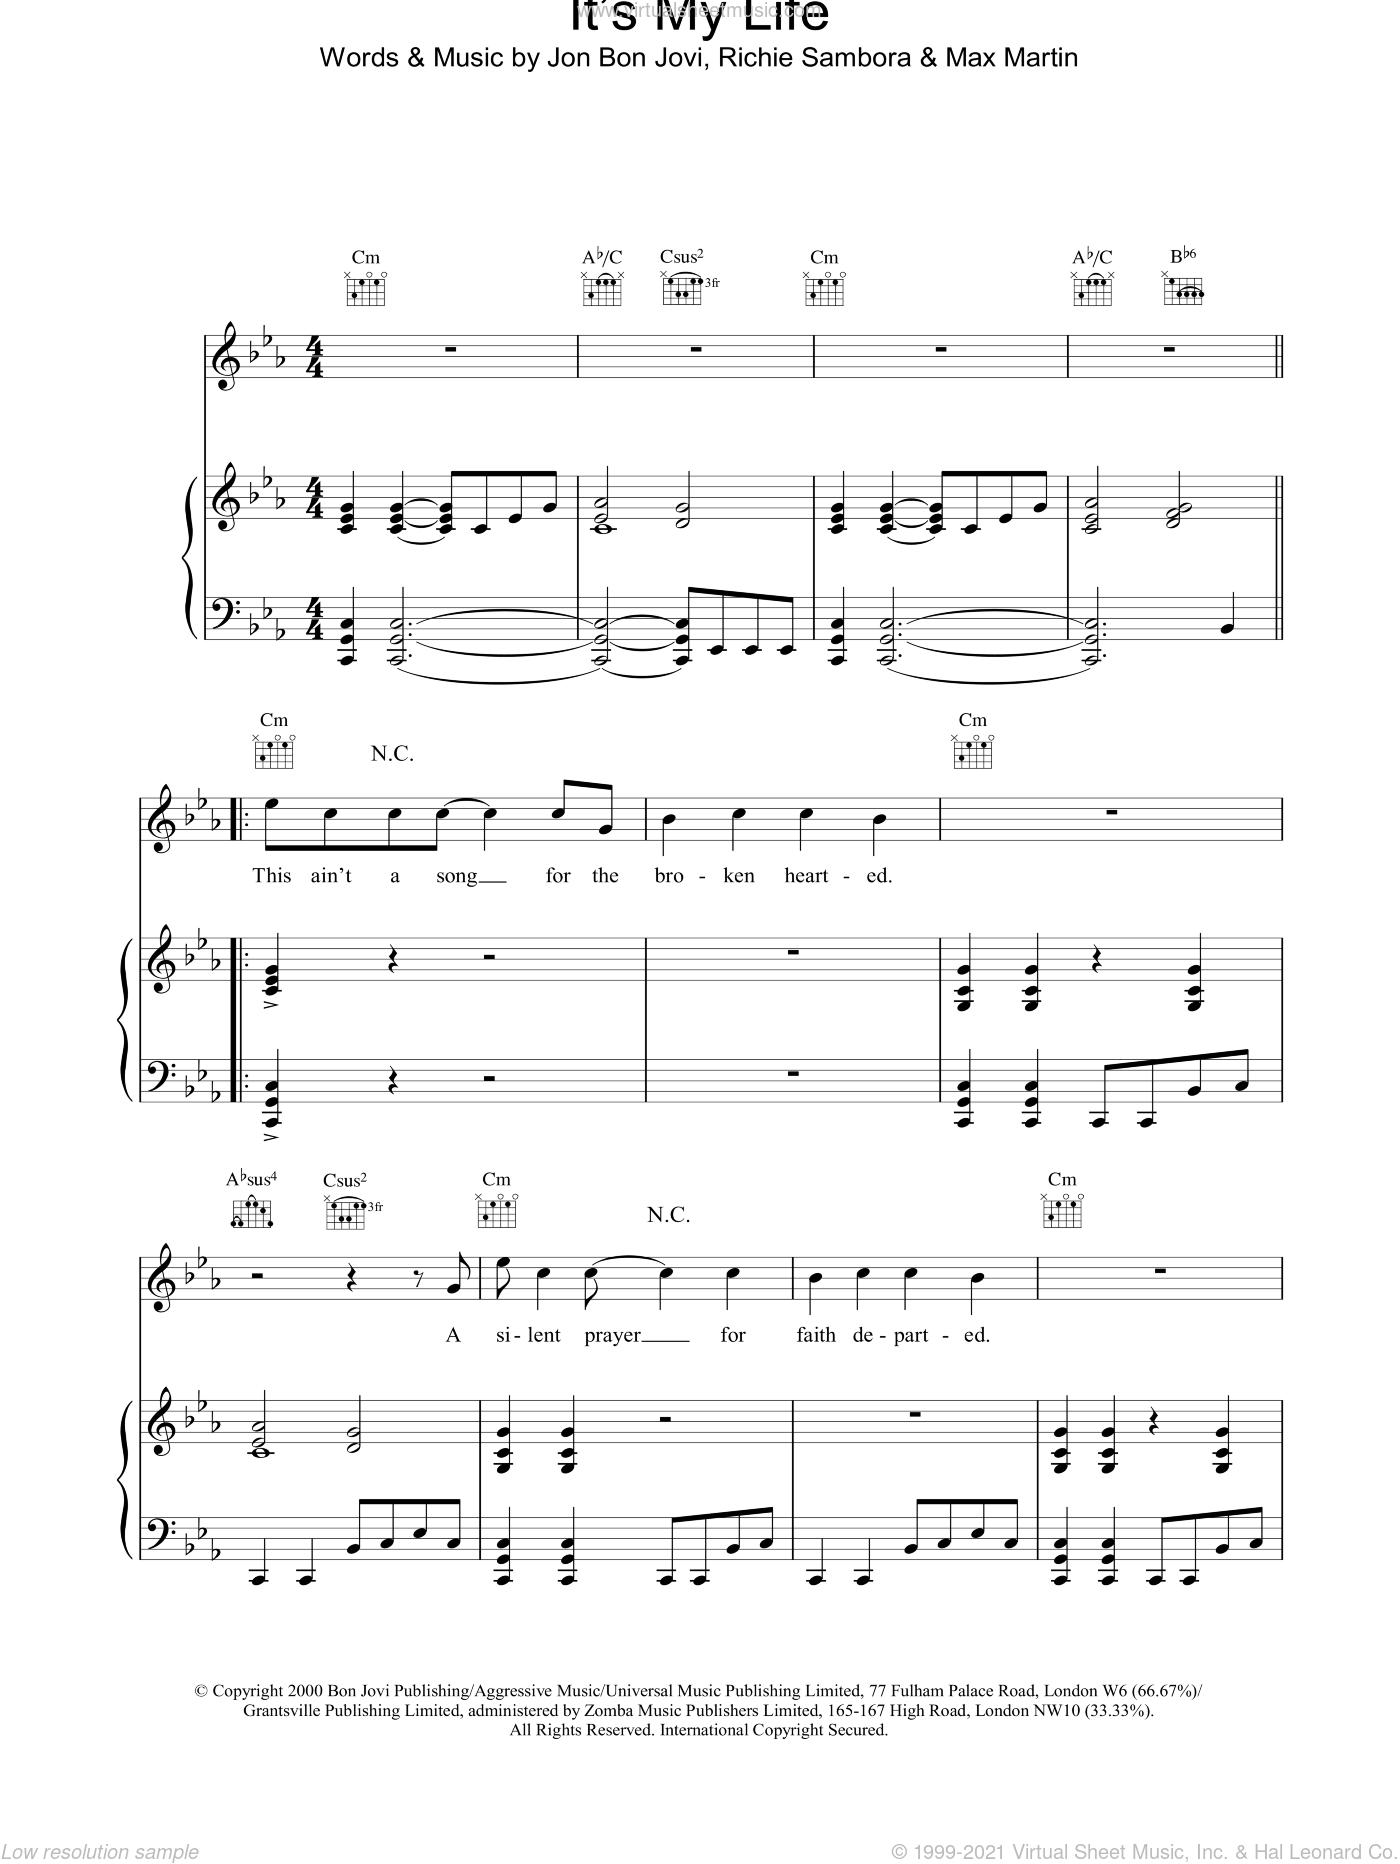 It's My Life sheet music for voice, piano or guitar by Bon Jovi, Ivor Martin, Martin and Richie Sambora, intermediate skill level